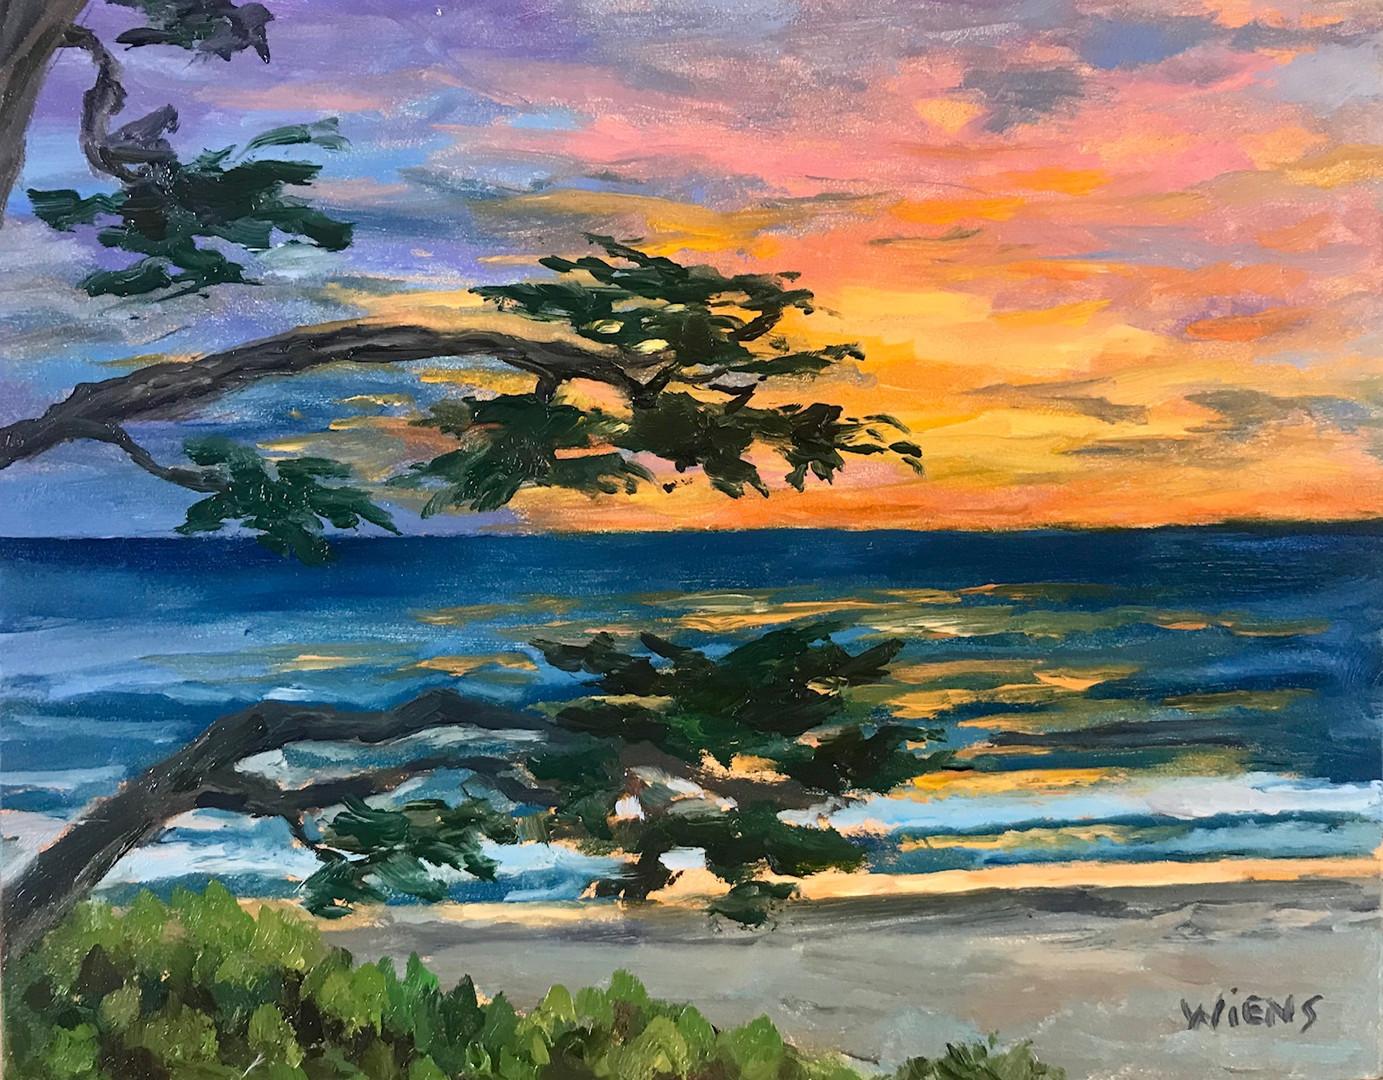 Carmel Beach Sunset 4x5in #364.jpg